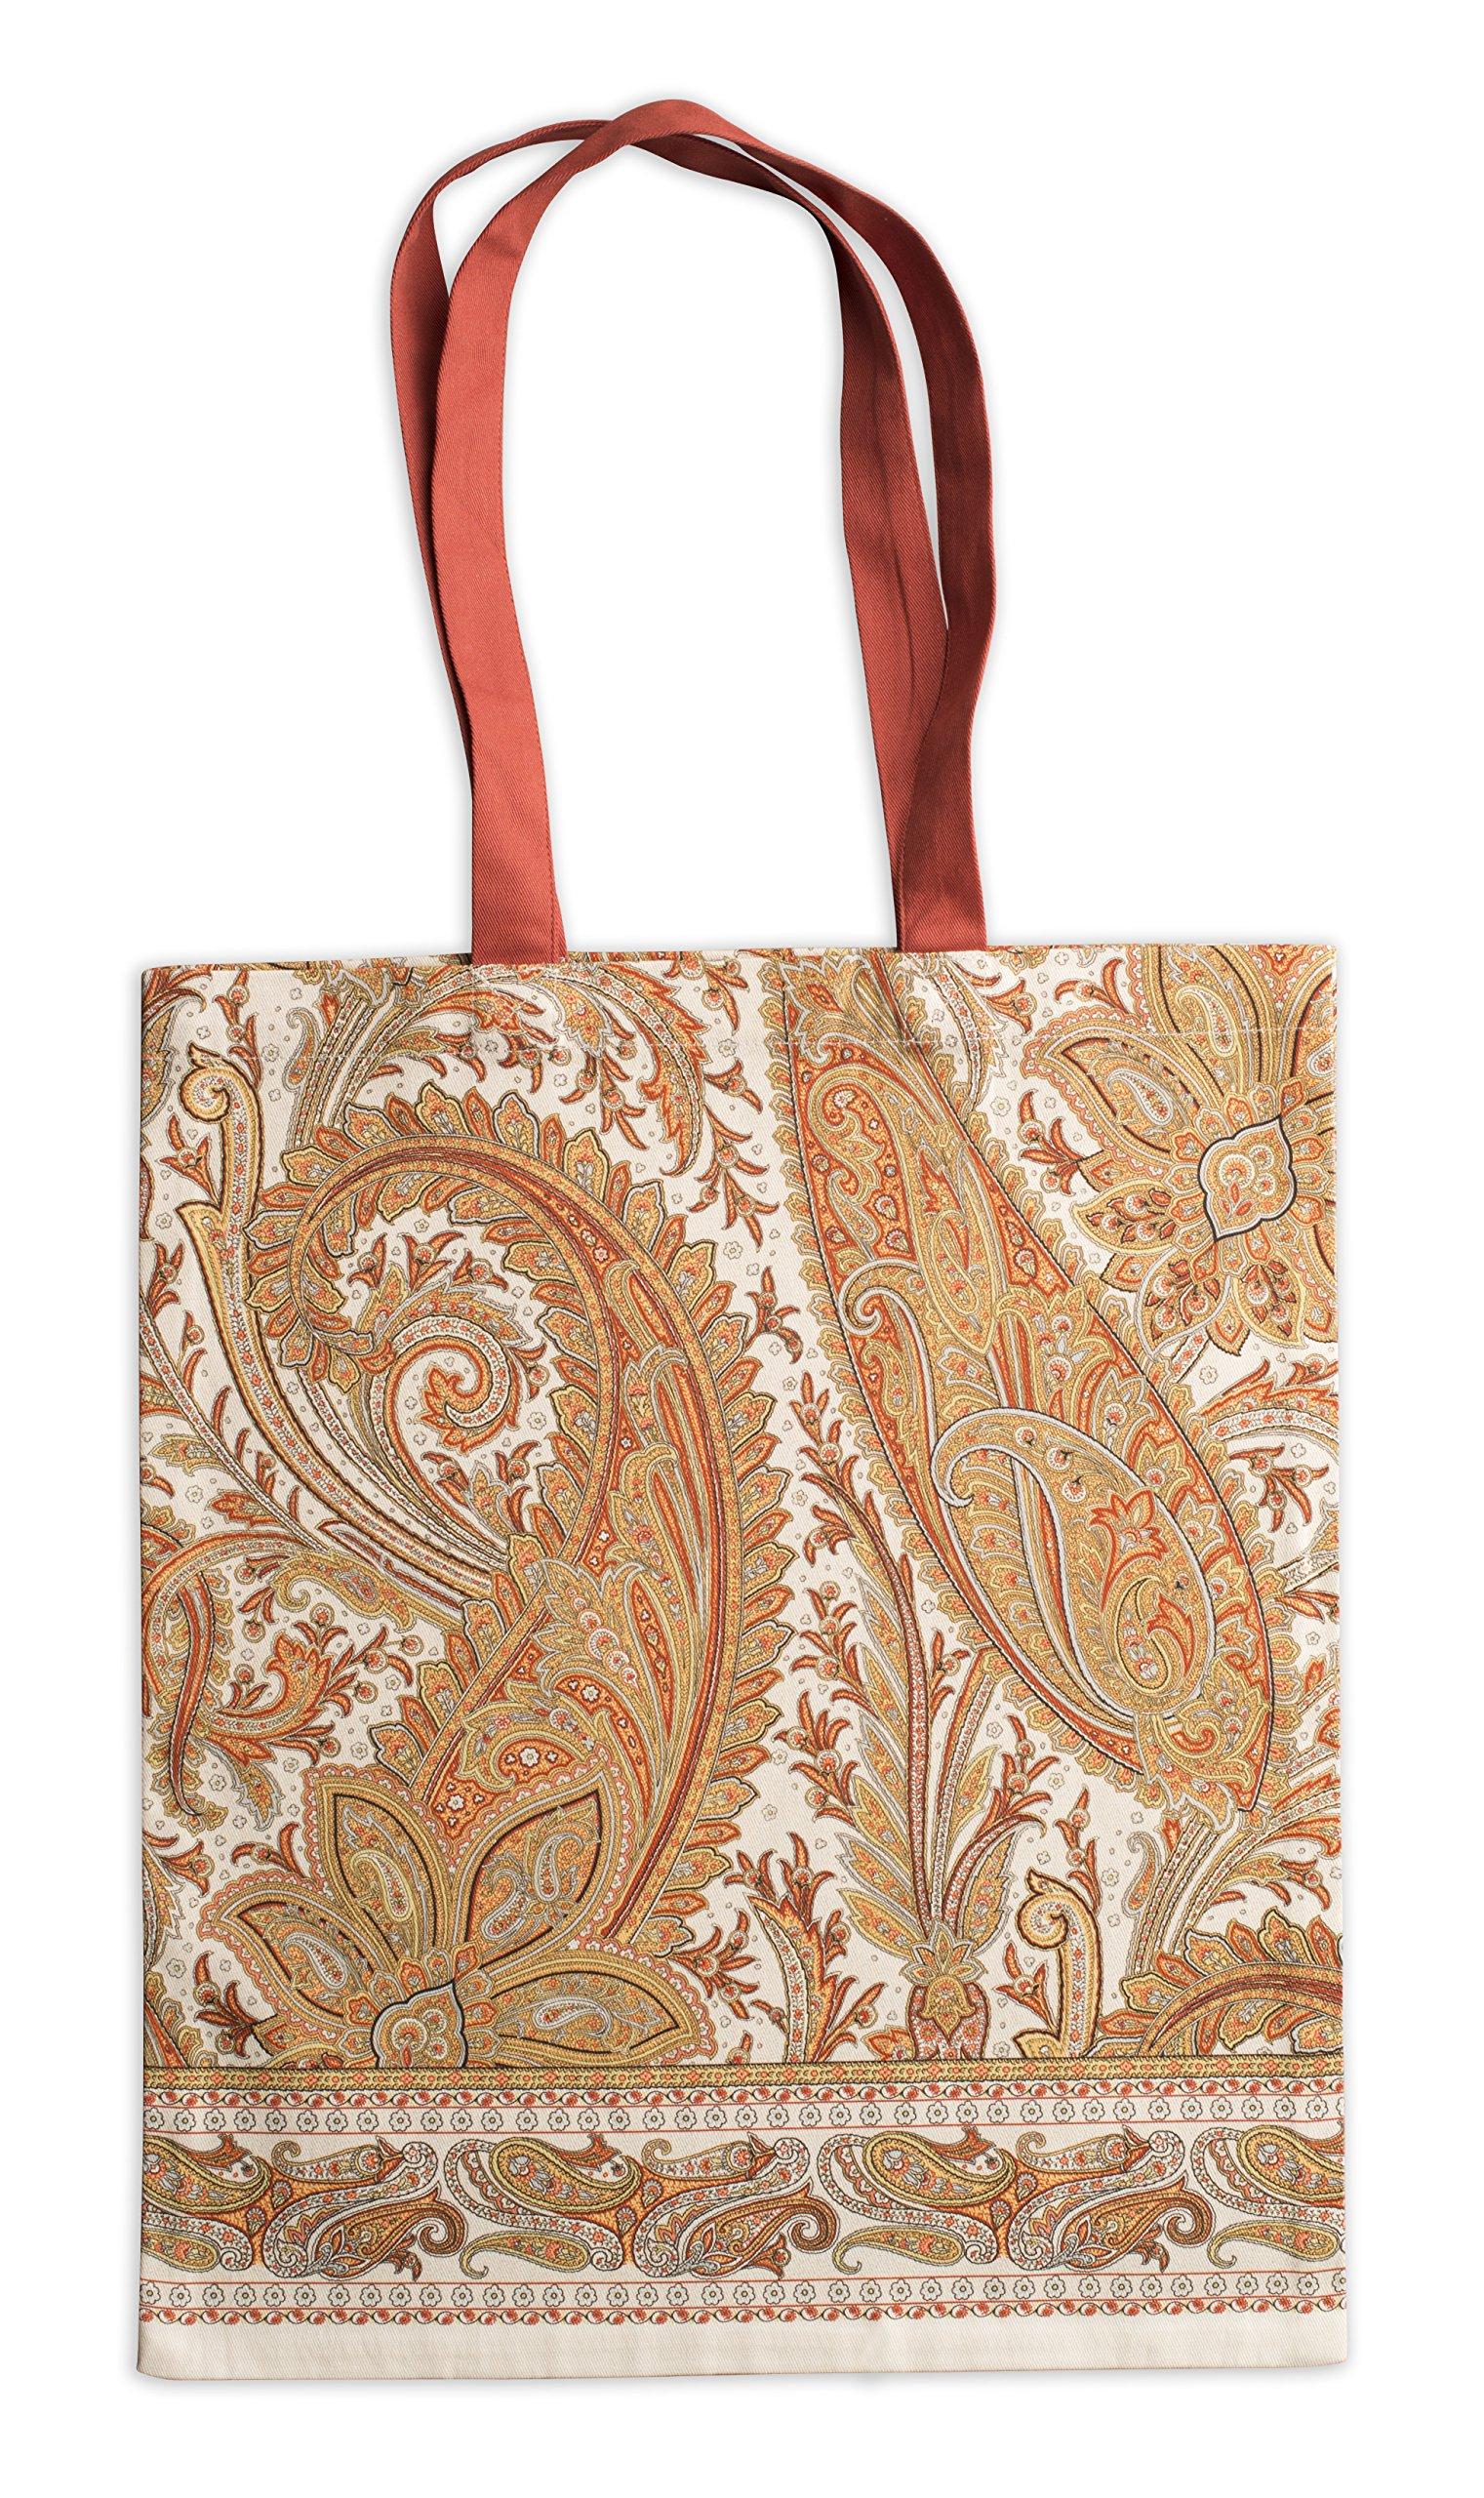 Maison d' Hermine Kashmir Paisley 100% Cotton Tote Bag 14 Inch by 17 Inch.